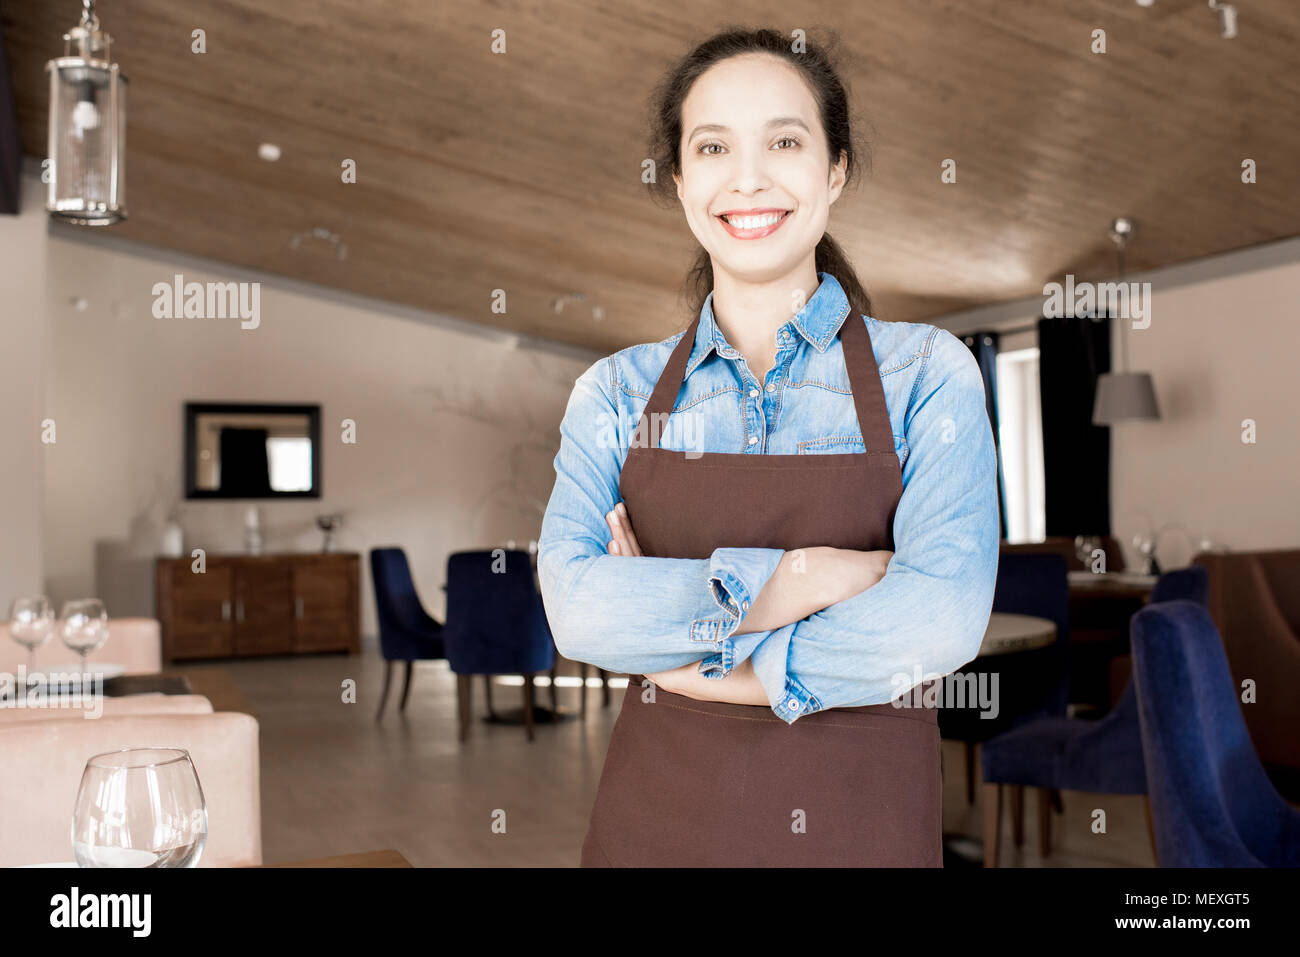 Fröhliche schöne Kellnerin im Cafe Stockbild